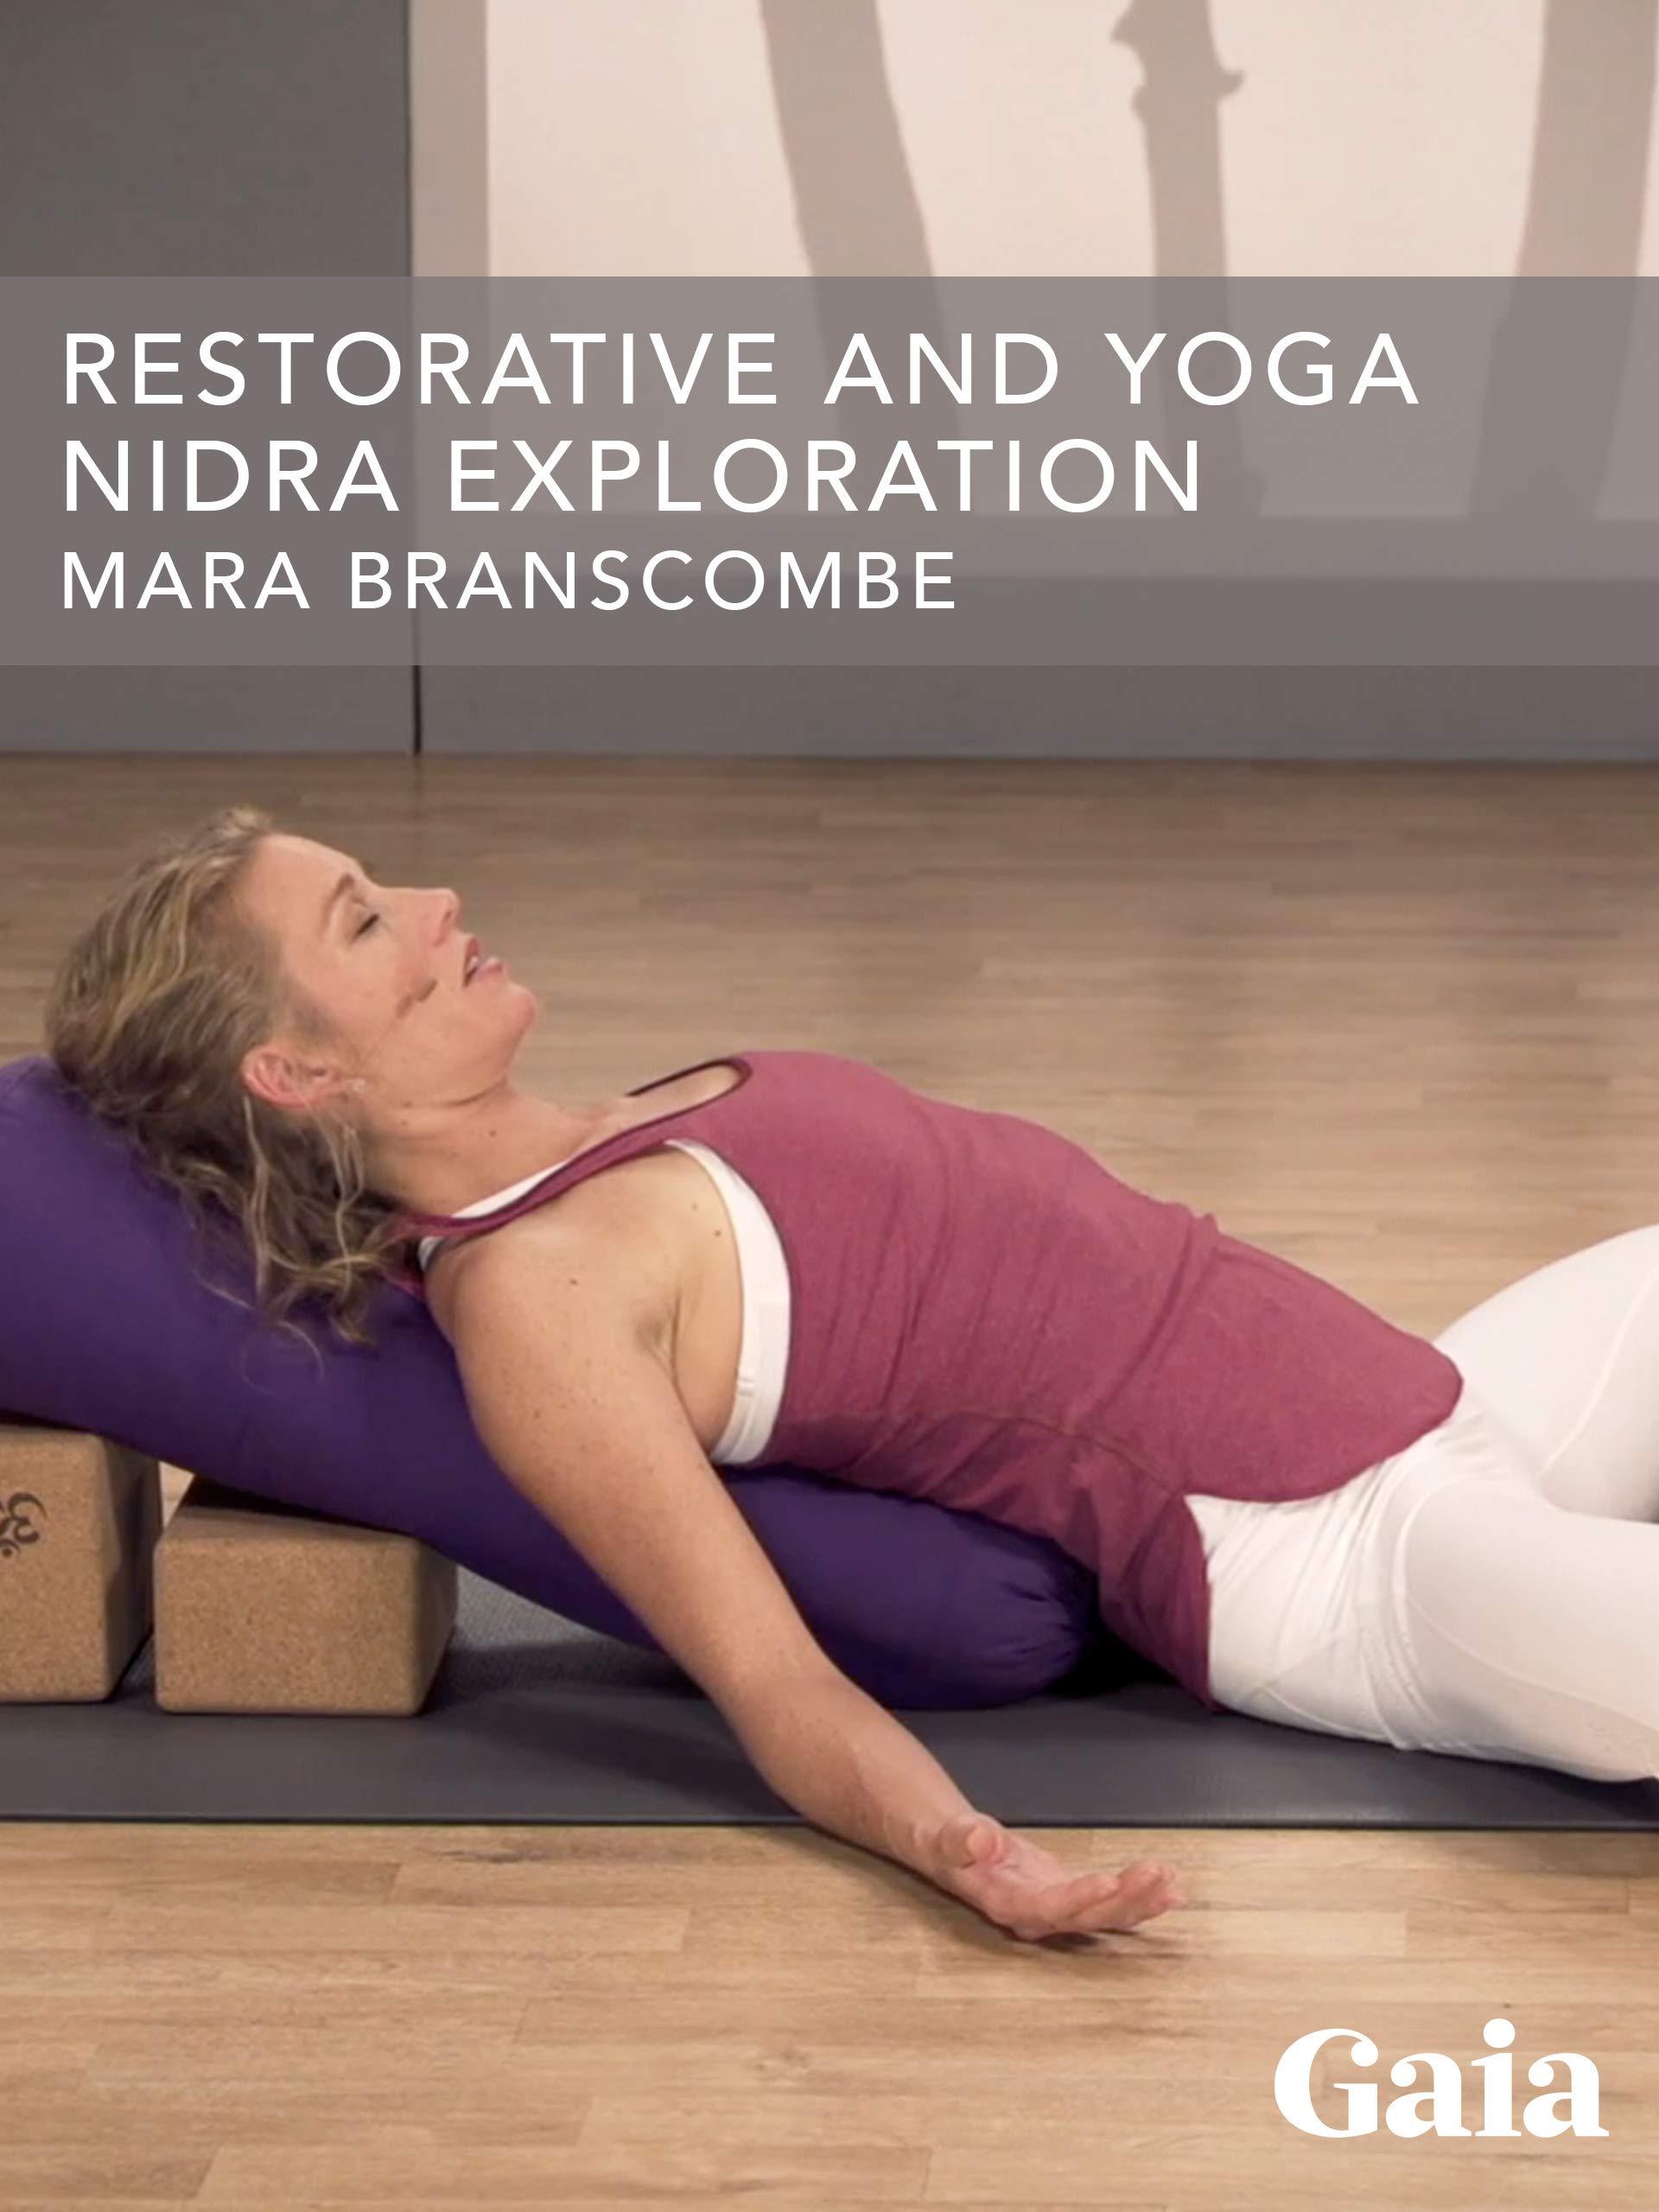 Watch Restorative and Yoga Nidra Exploration   Prime Video